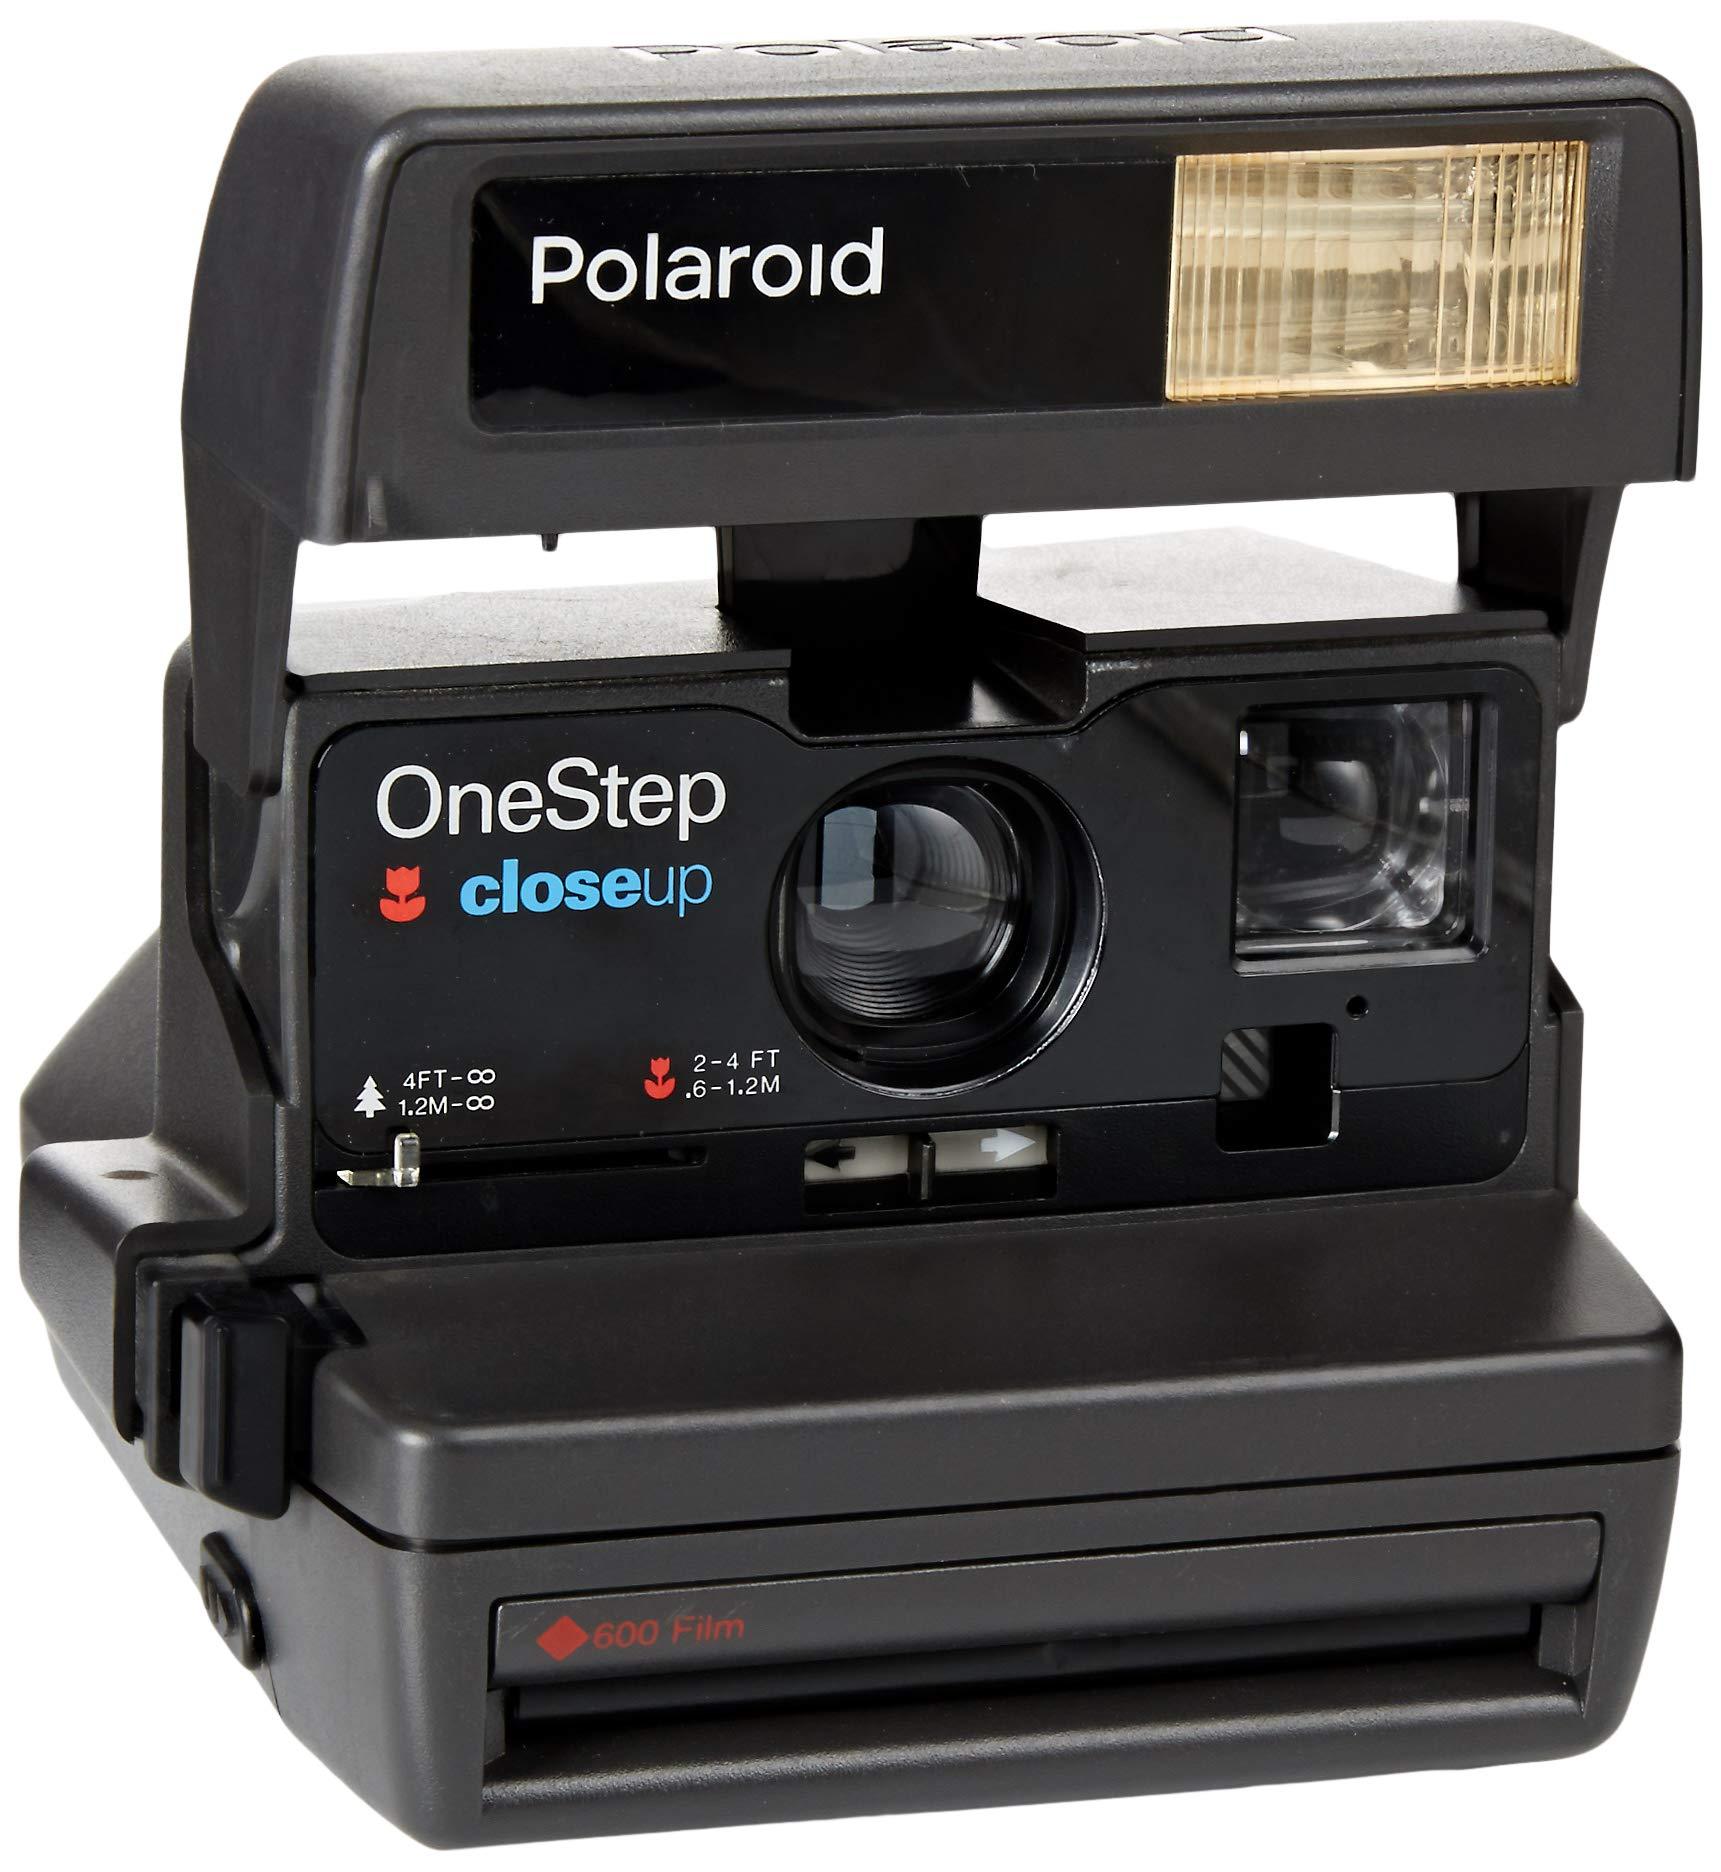 Polaroid One Step Close-Up 600 Instant Camera by Polaroid